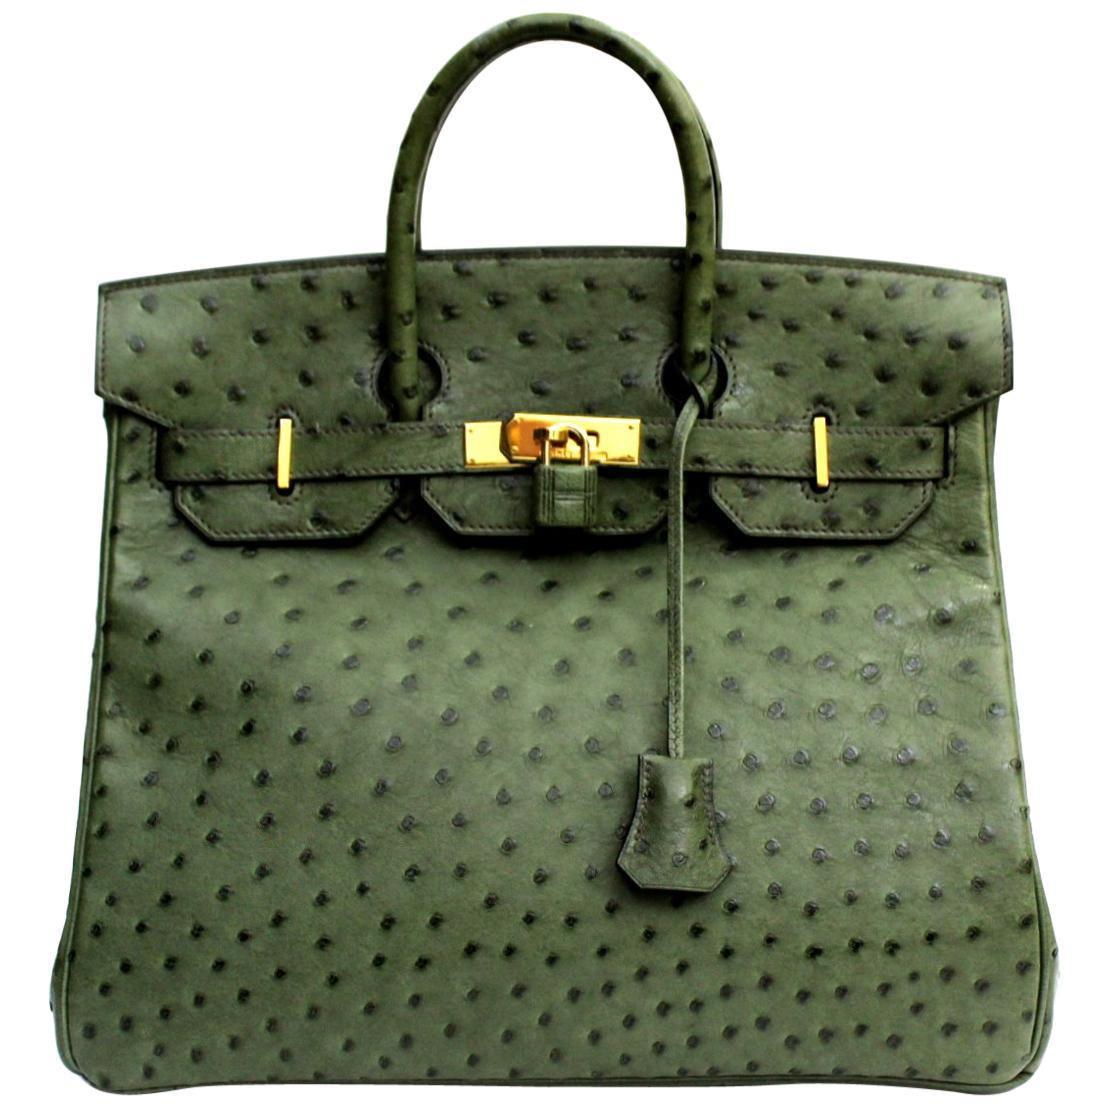 Hermes 30 cm Green Leather Birkin Bag